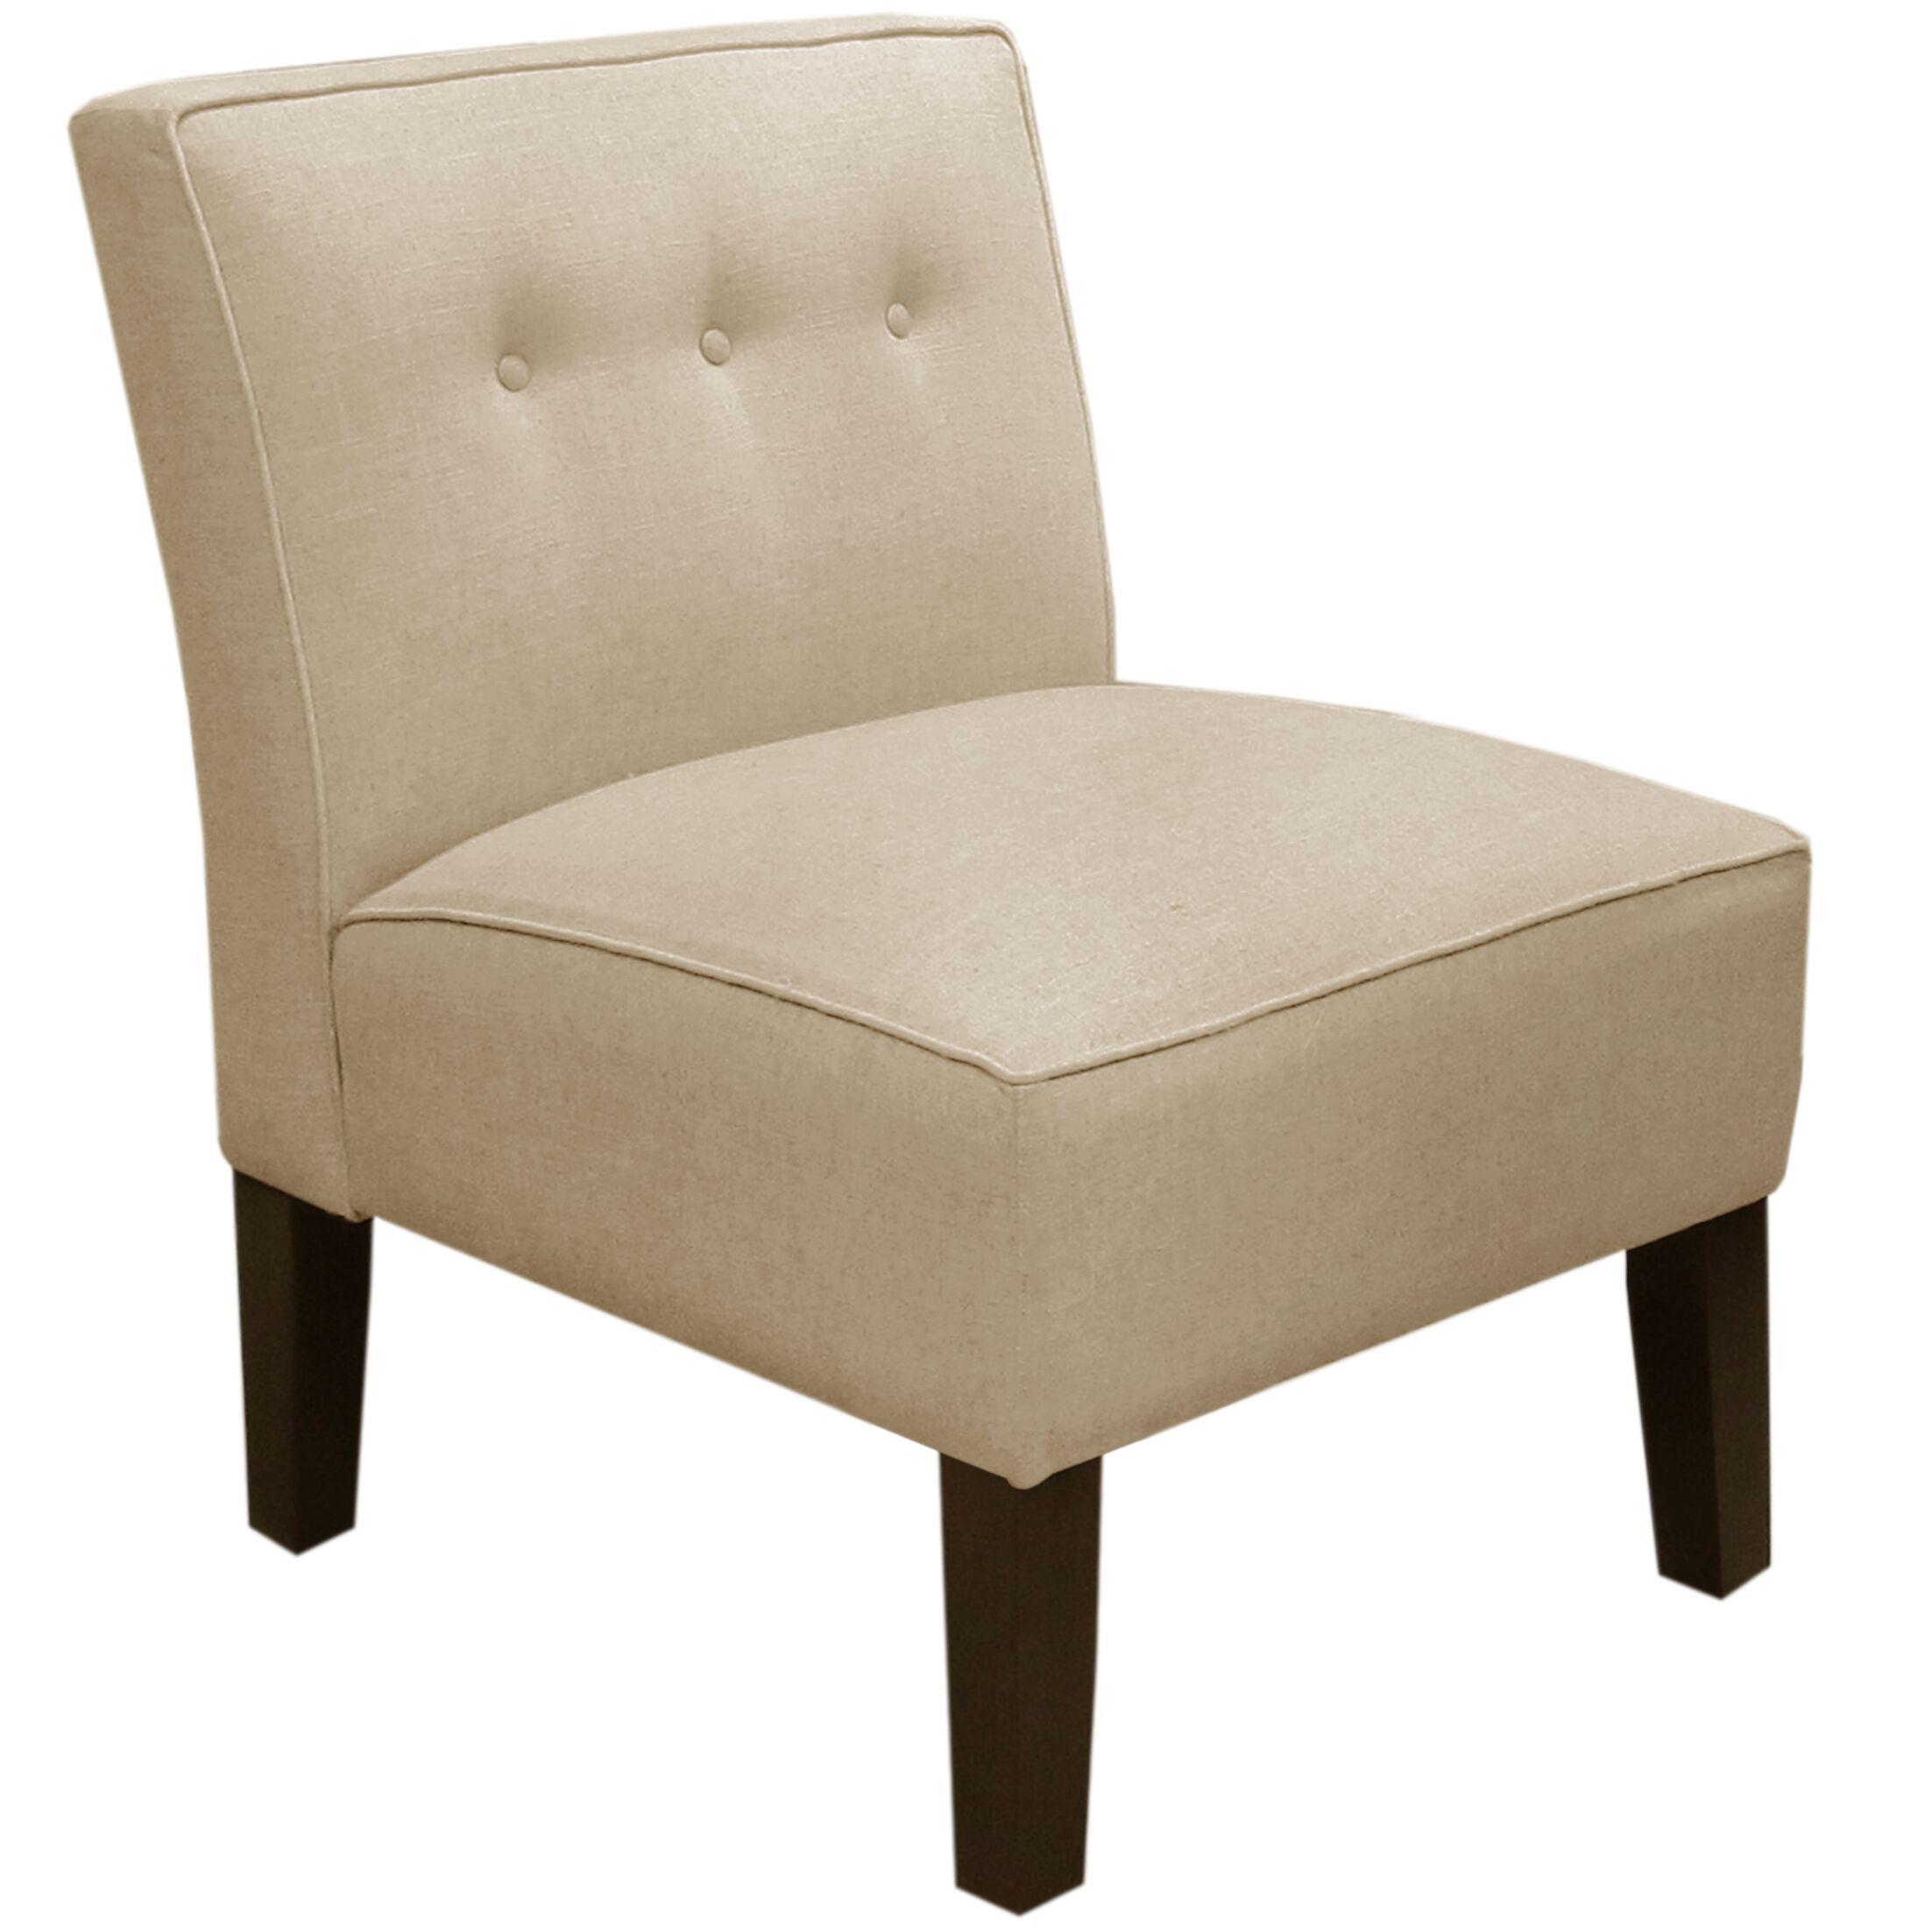 Veronica Side Chair